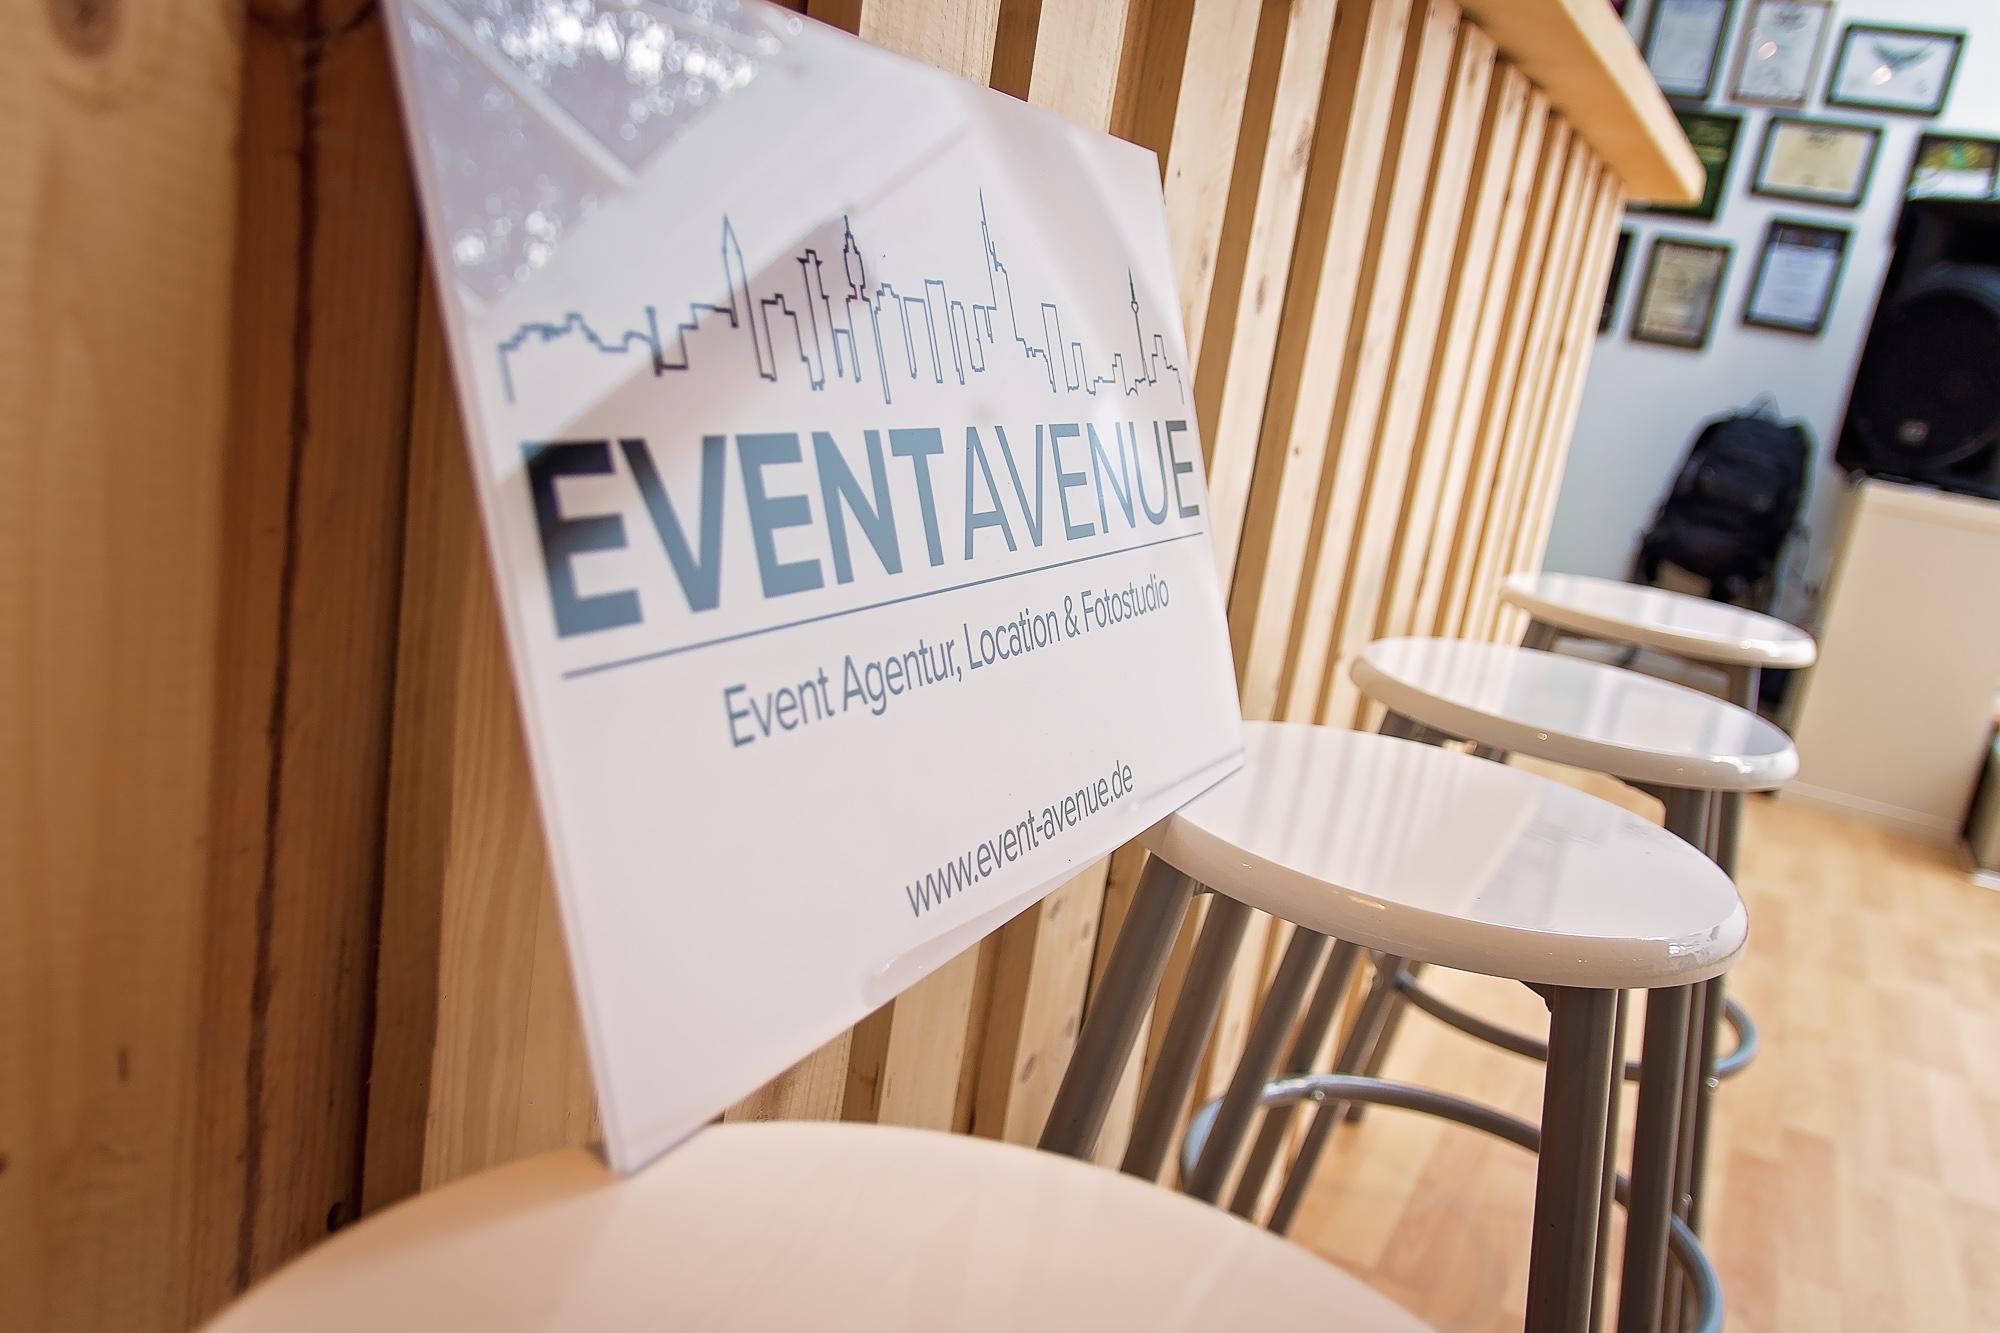 Event Avenue Frankfurt